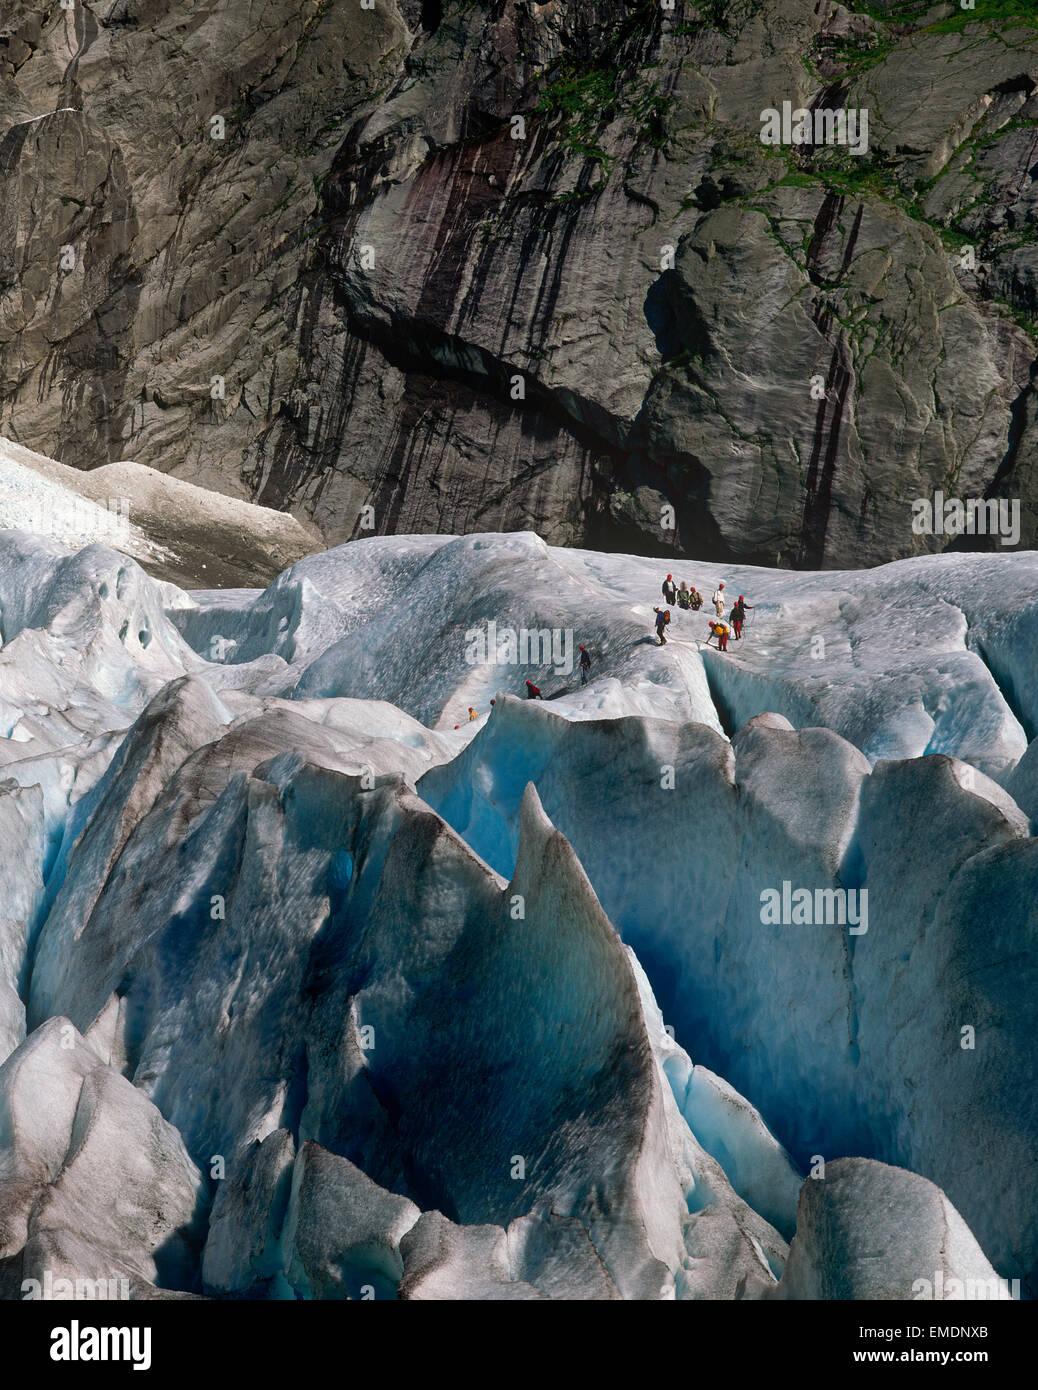 Hikers on the Briksdalsbreen glacier; an arm of the Jostedalsbreen glacier, Olden, Sogn og Fjordane, Norway - Stock Image